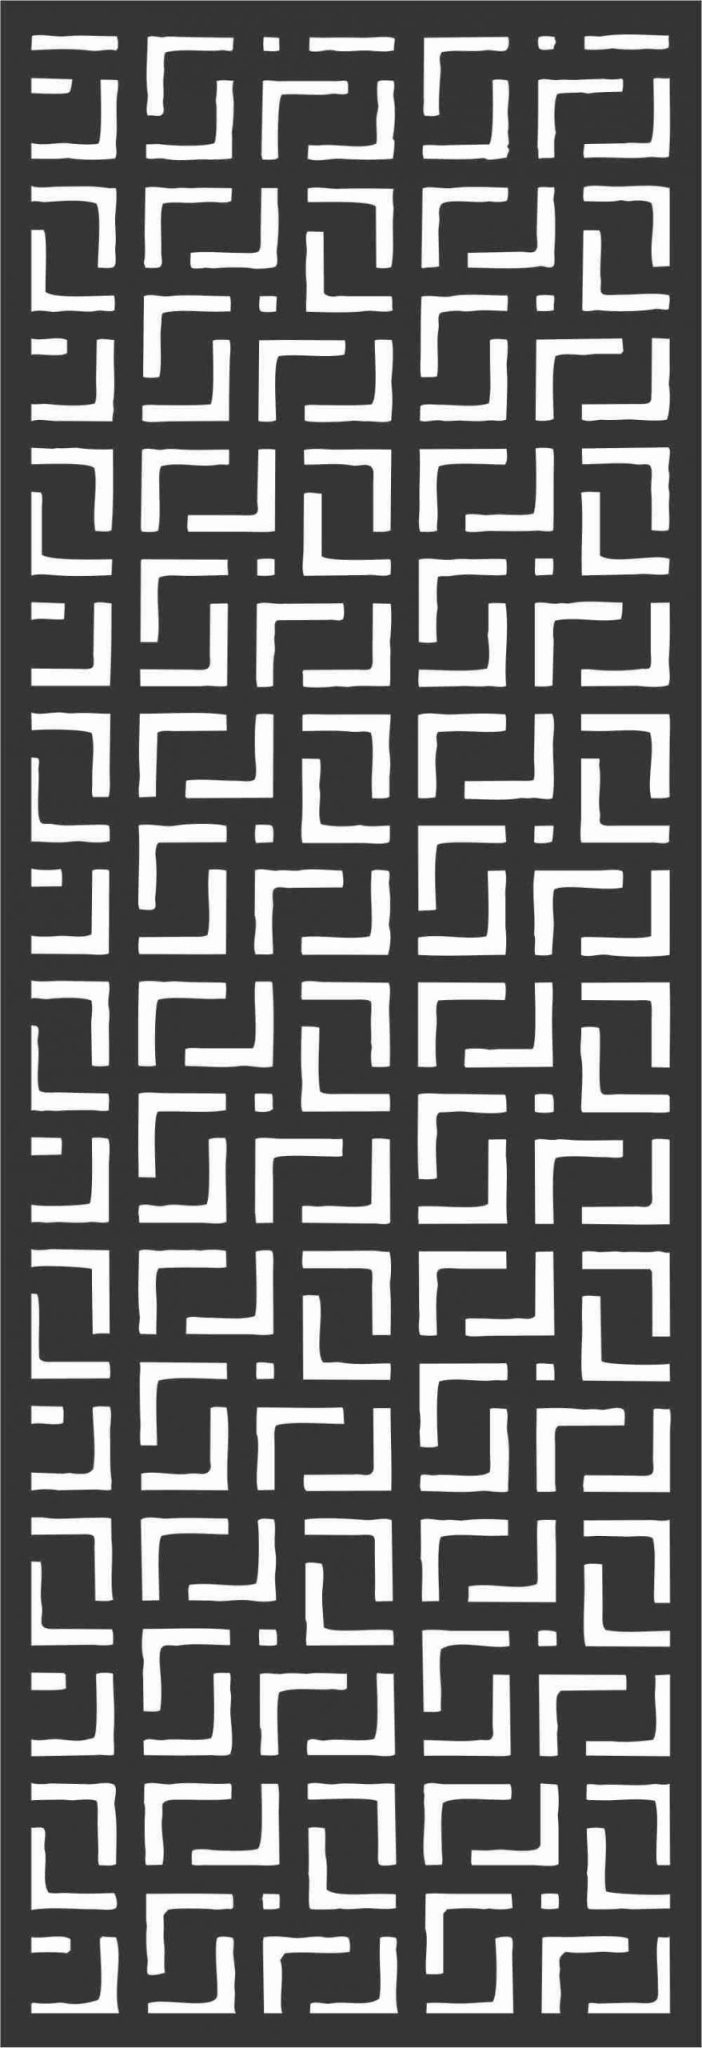 Screen Panel Patterns Seamless 39 Free DXF File